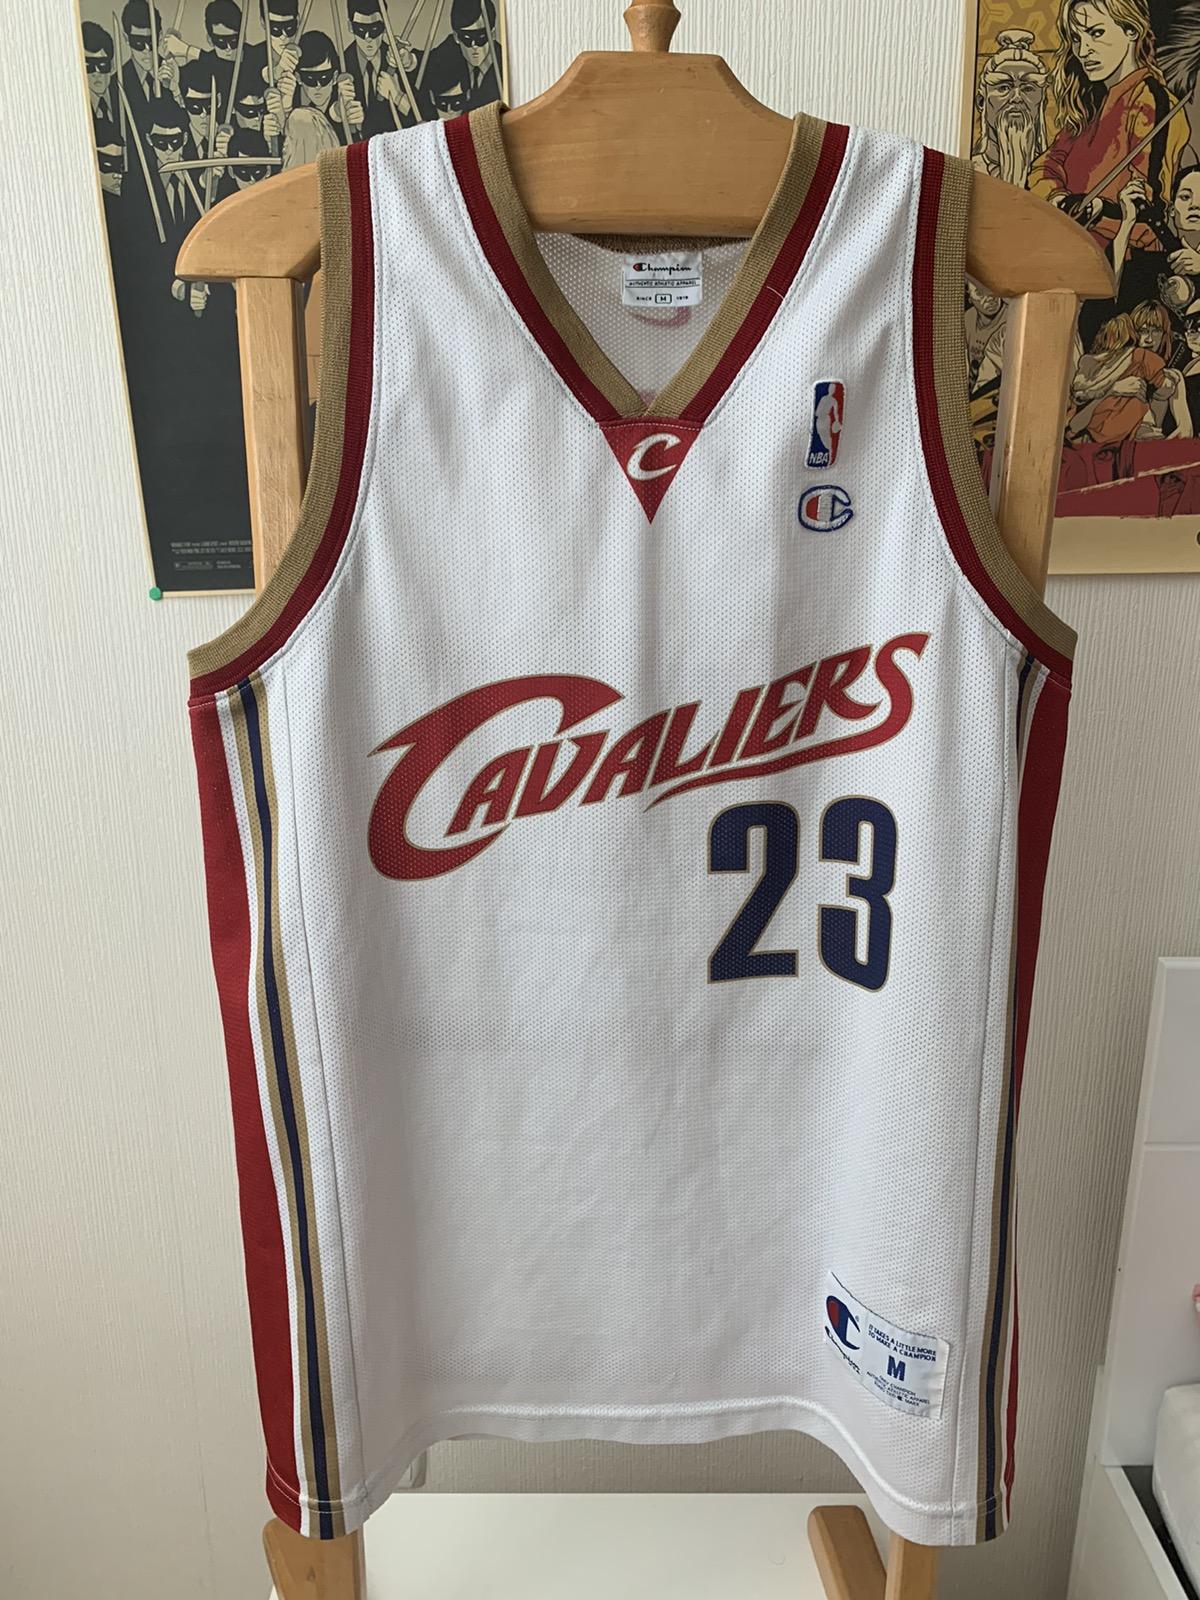 Champion VTG 90s Cleveland Cavaliers NBA Lebron James champion jersey